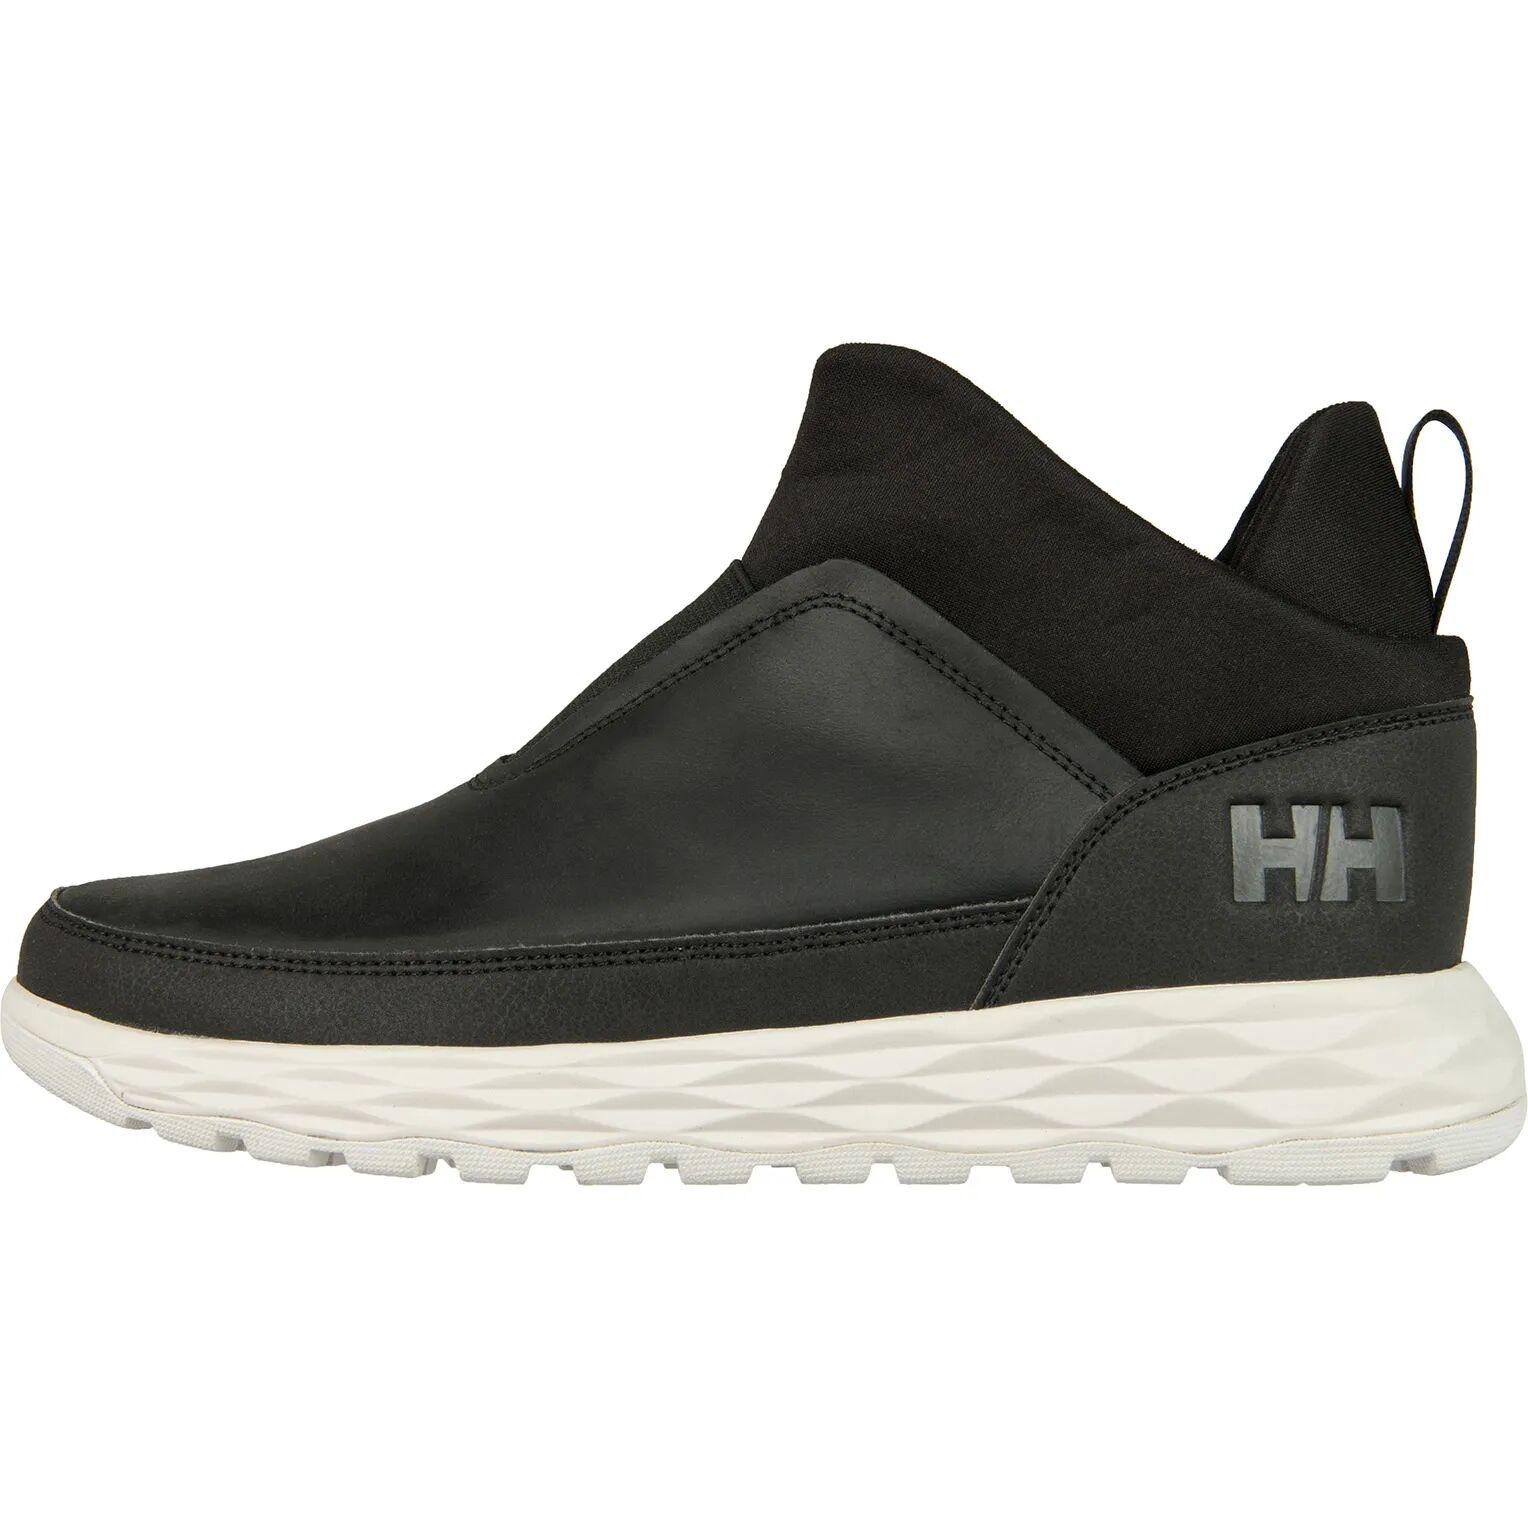 Helly Hansen W Cora Womens Casual Shoe Black 40.5/9